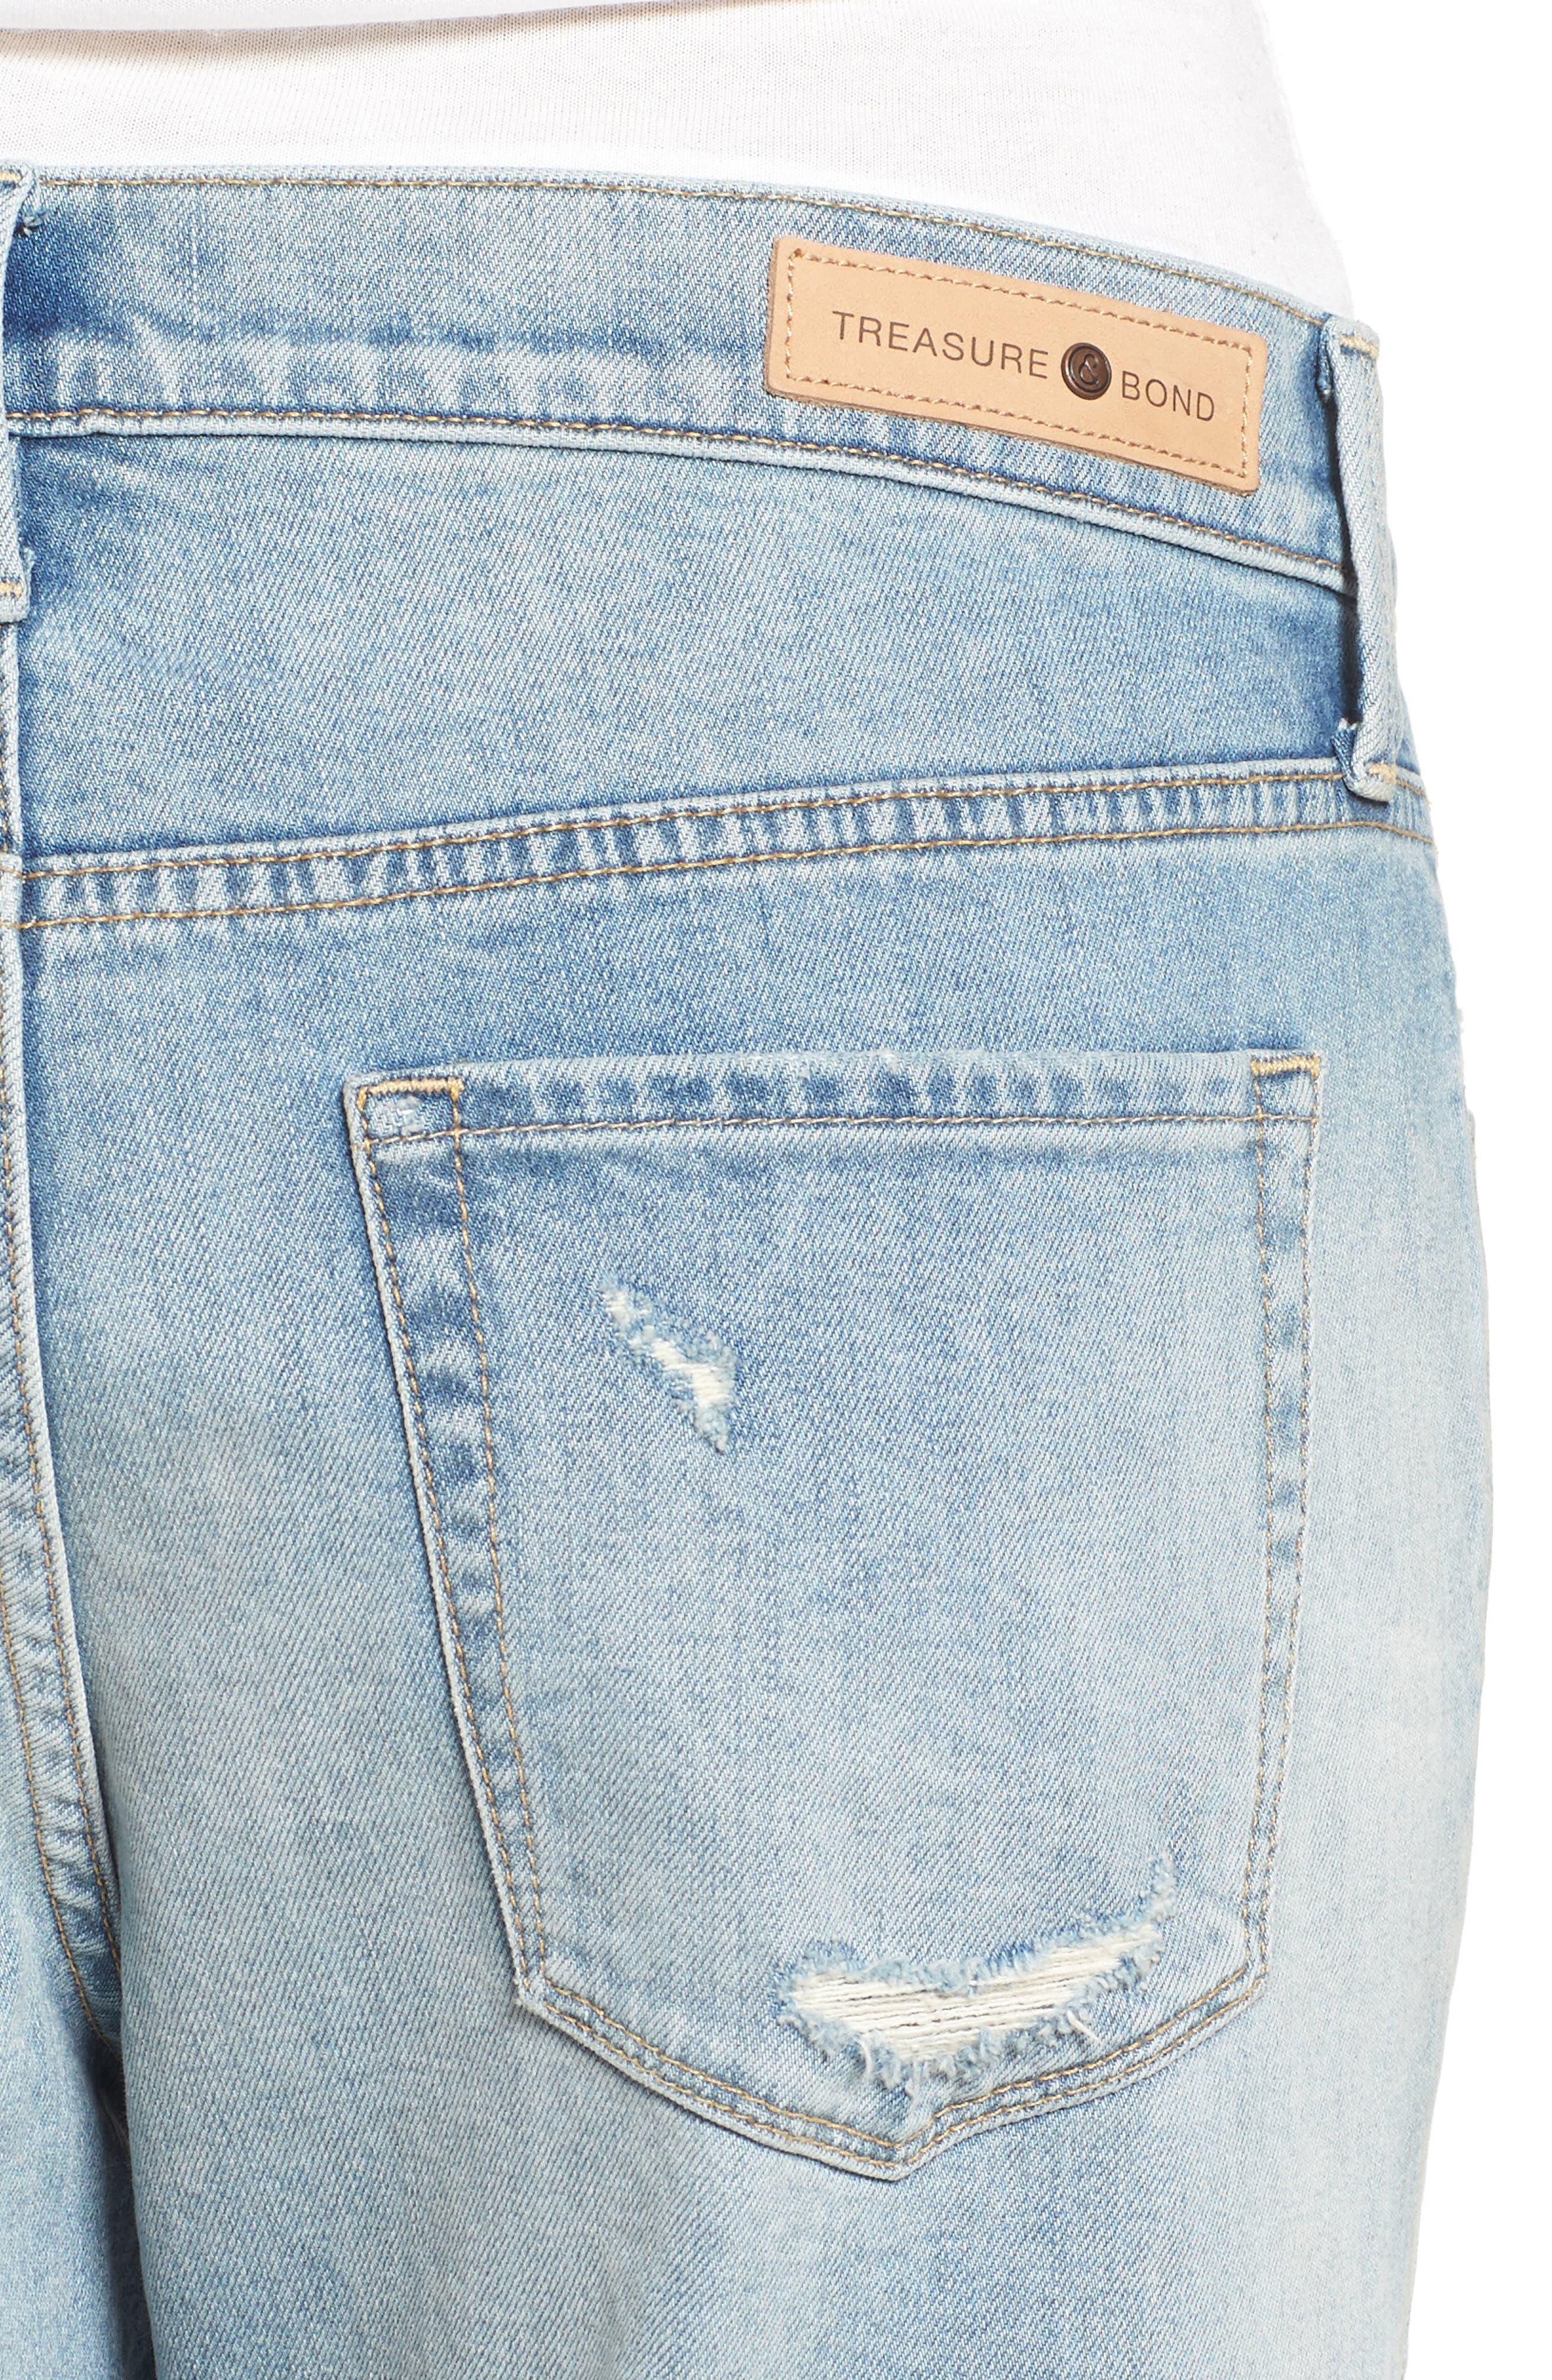 TREASURE & BOND,                             Boyfriend Jeans,                             Alternate thumbnail 4, color,                             400